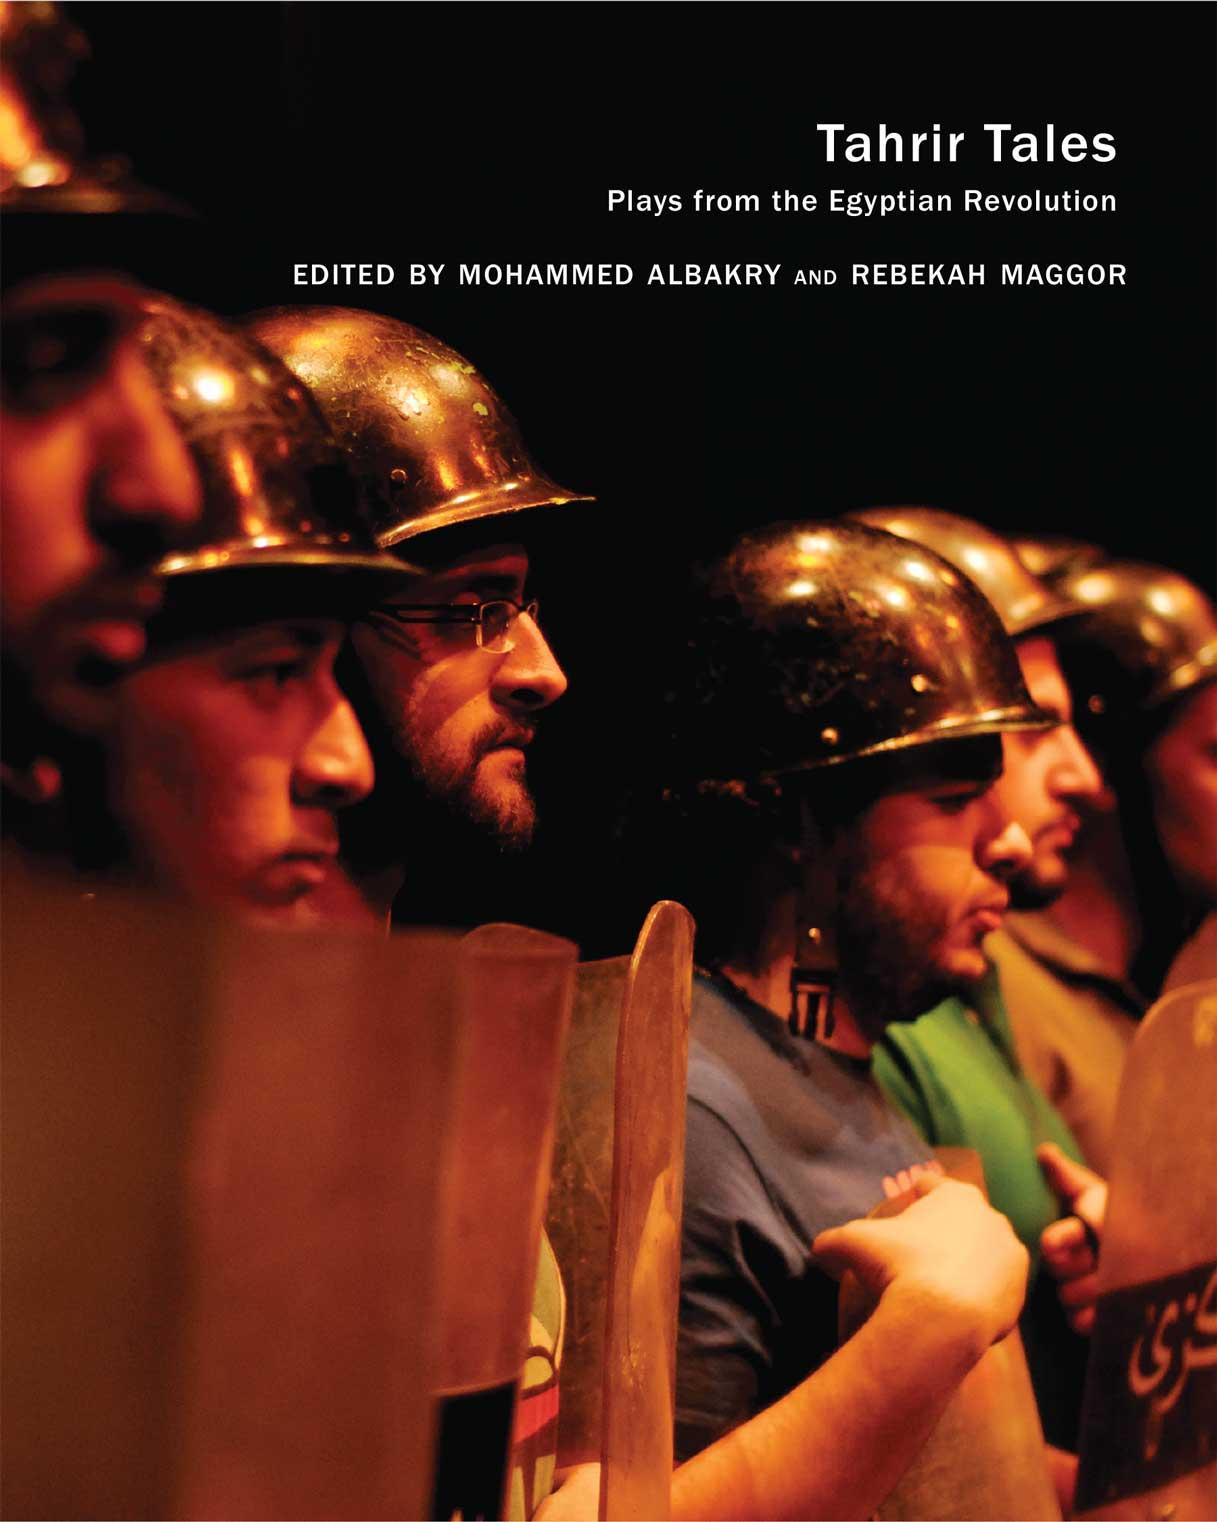 Tahrir Tales